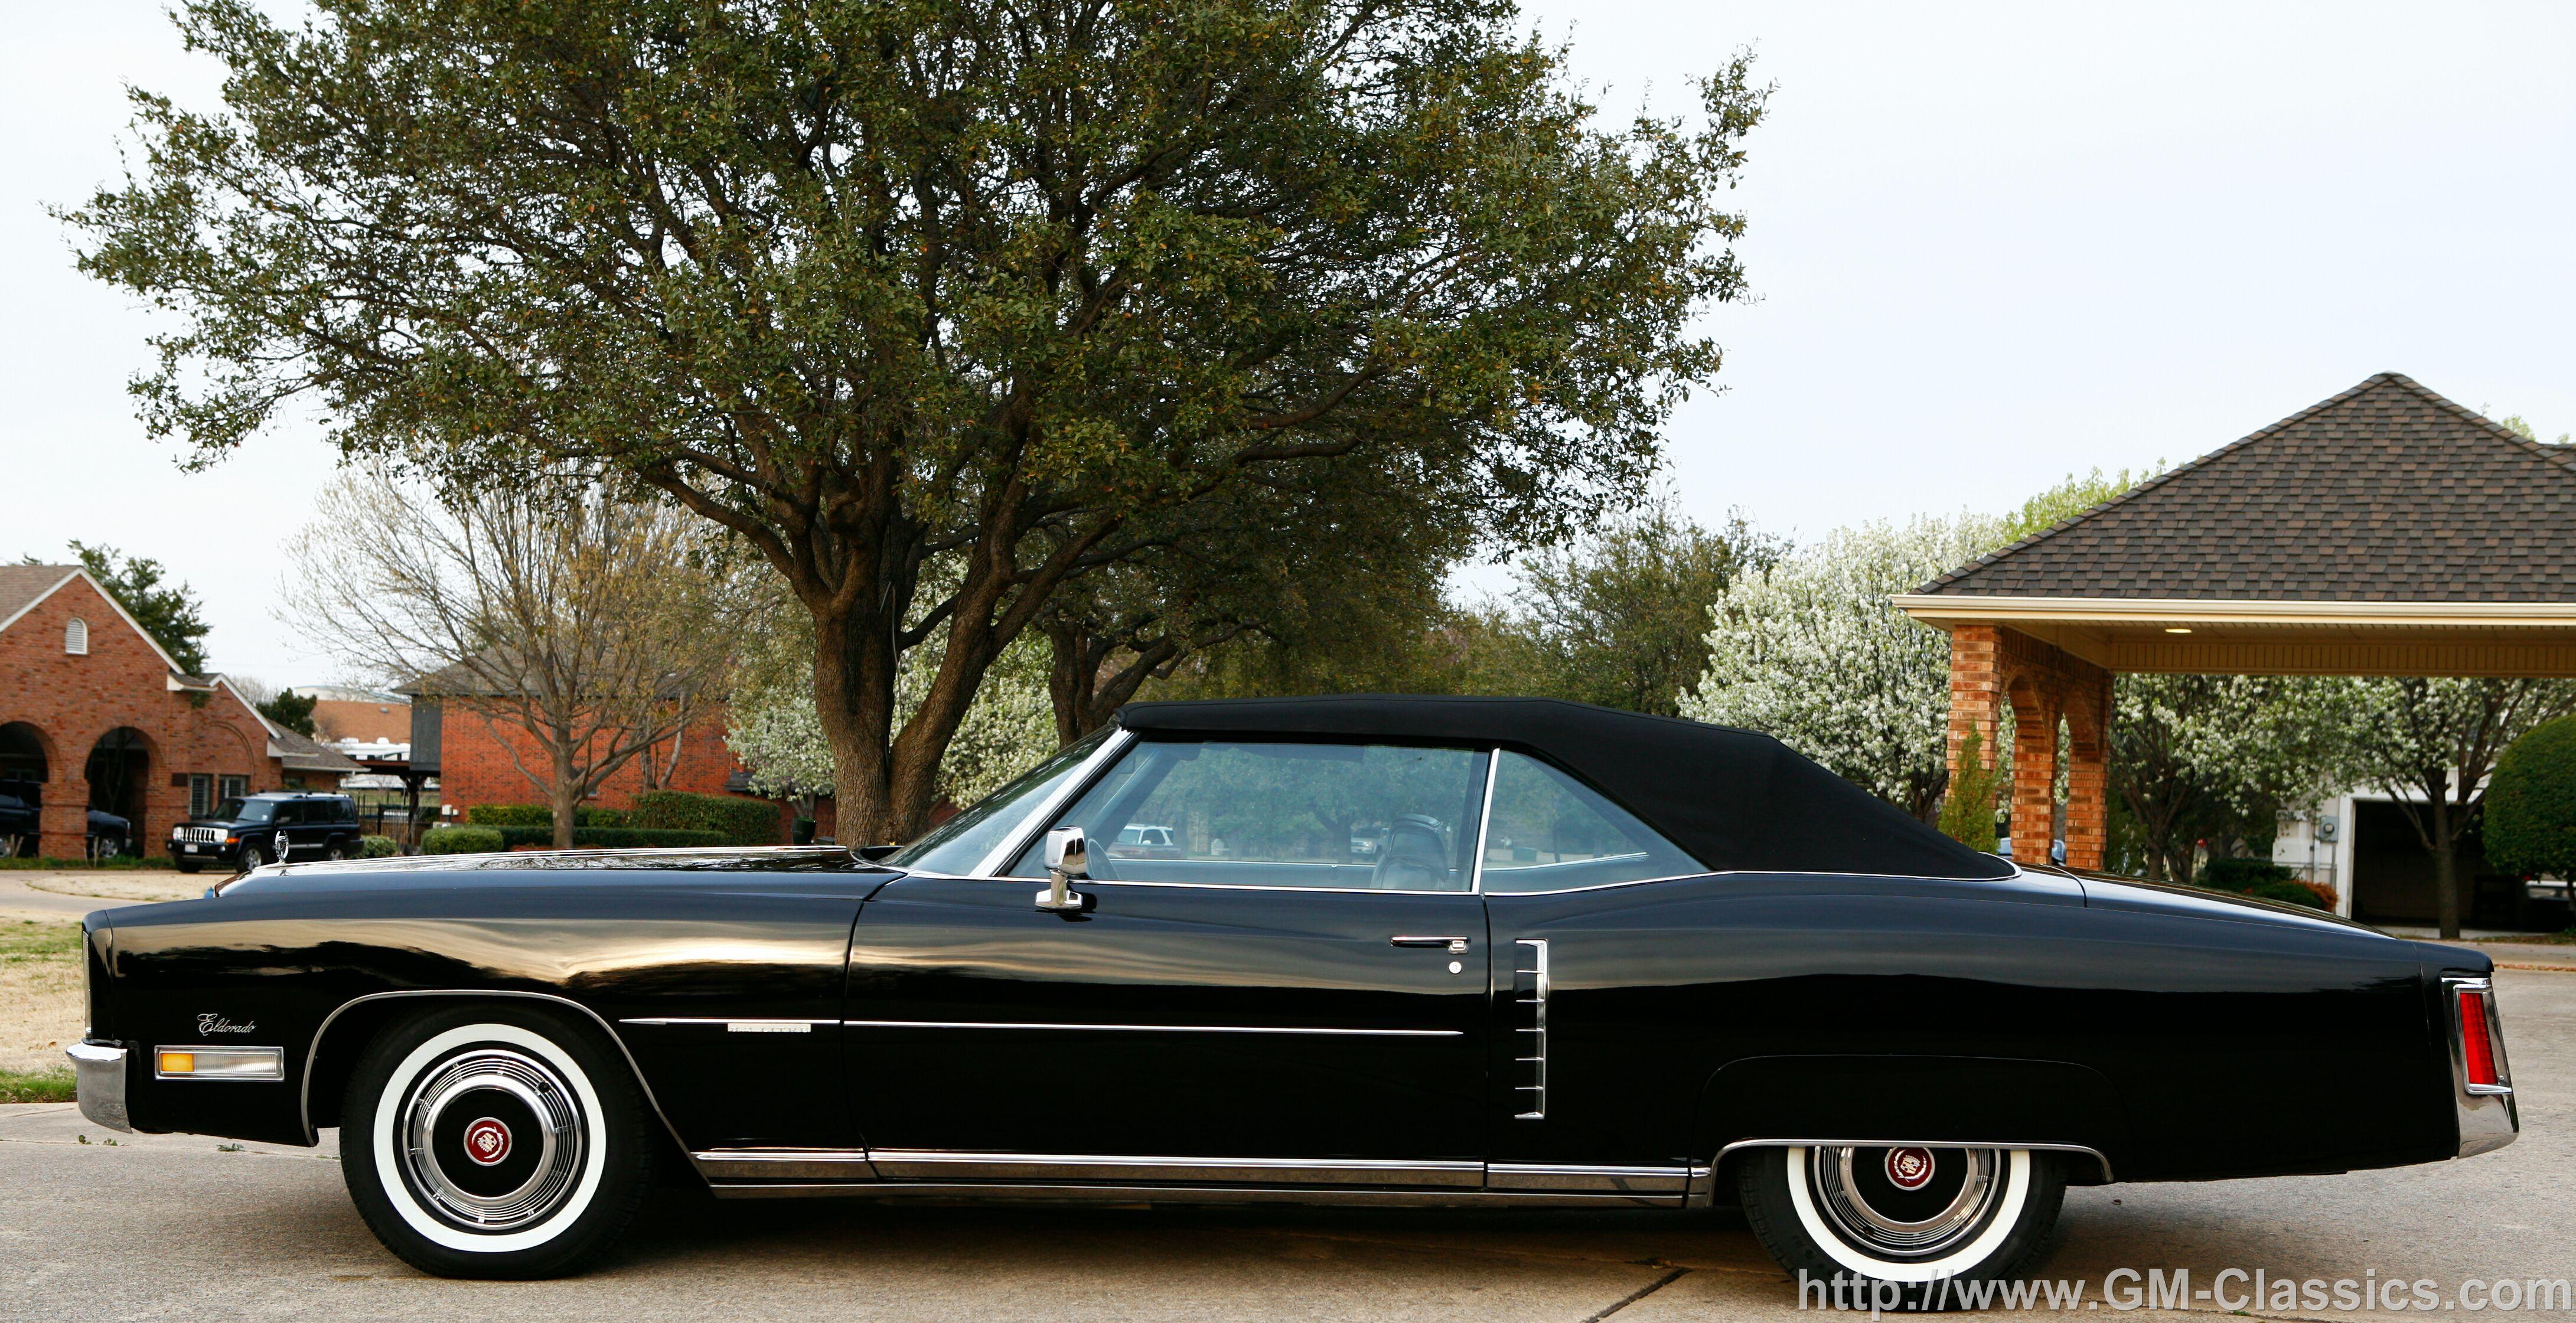 1972 Cadillac Eldorado Convertible - Matt Garrett 3f744bc19b60